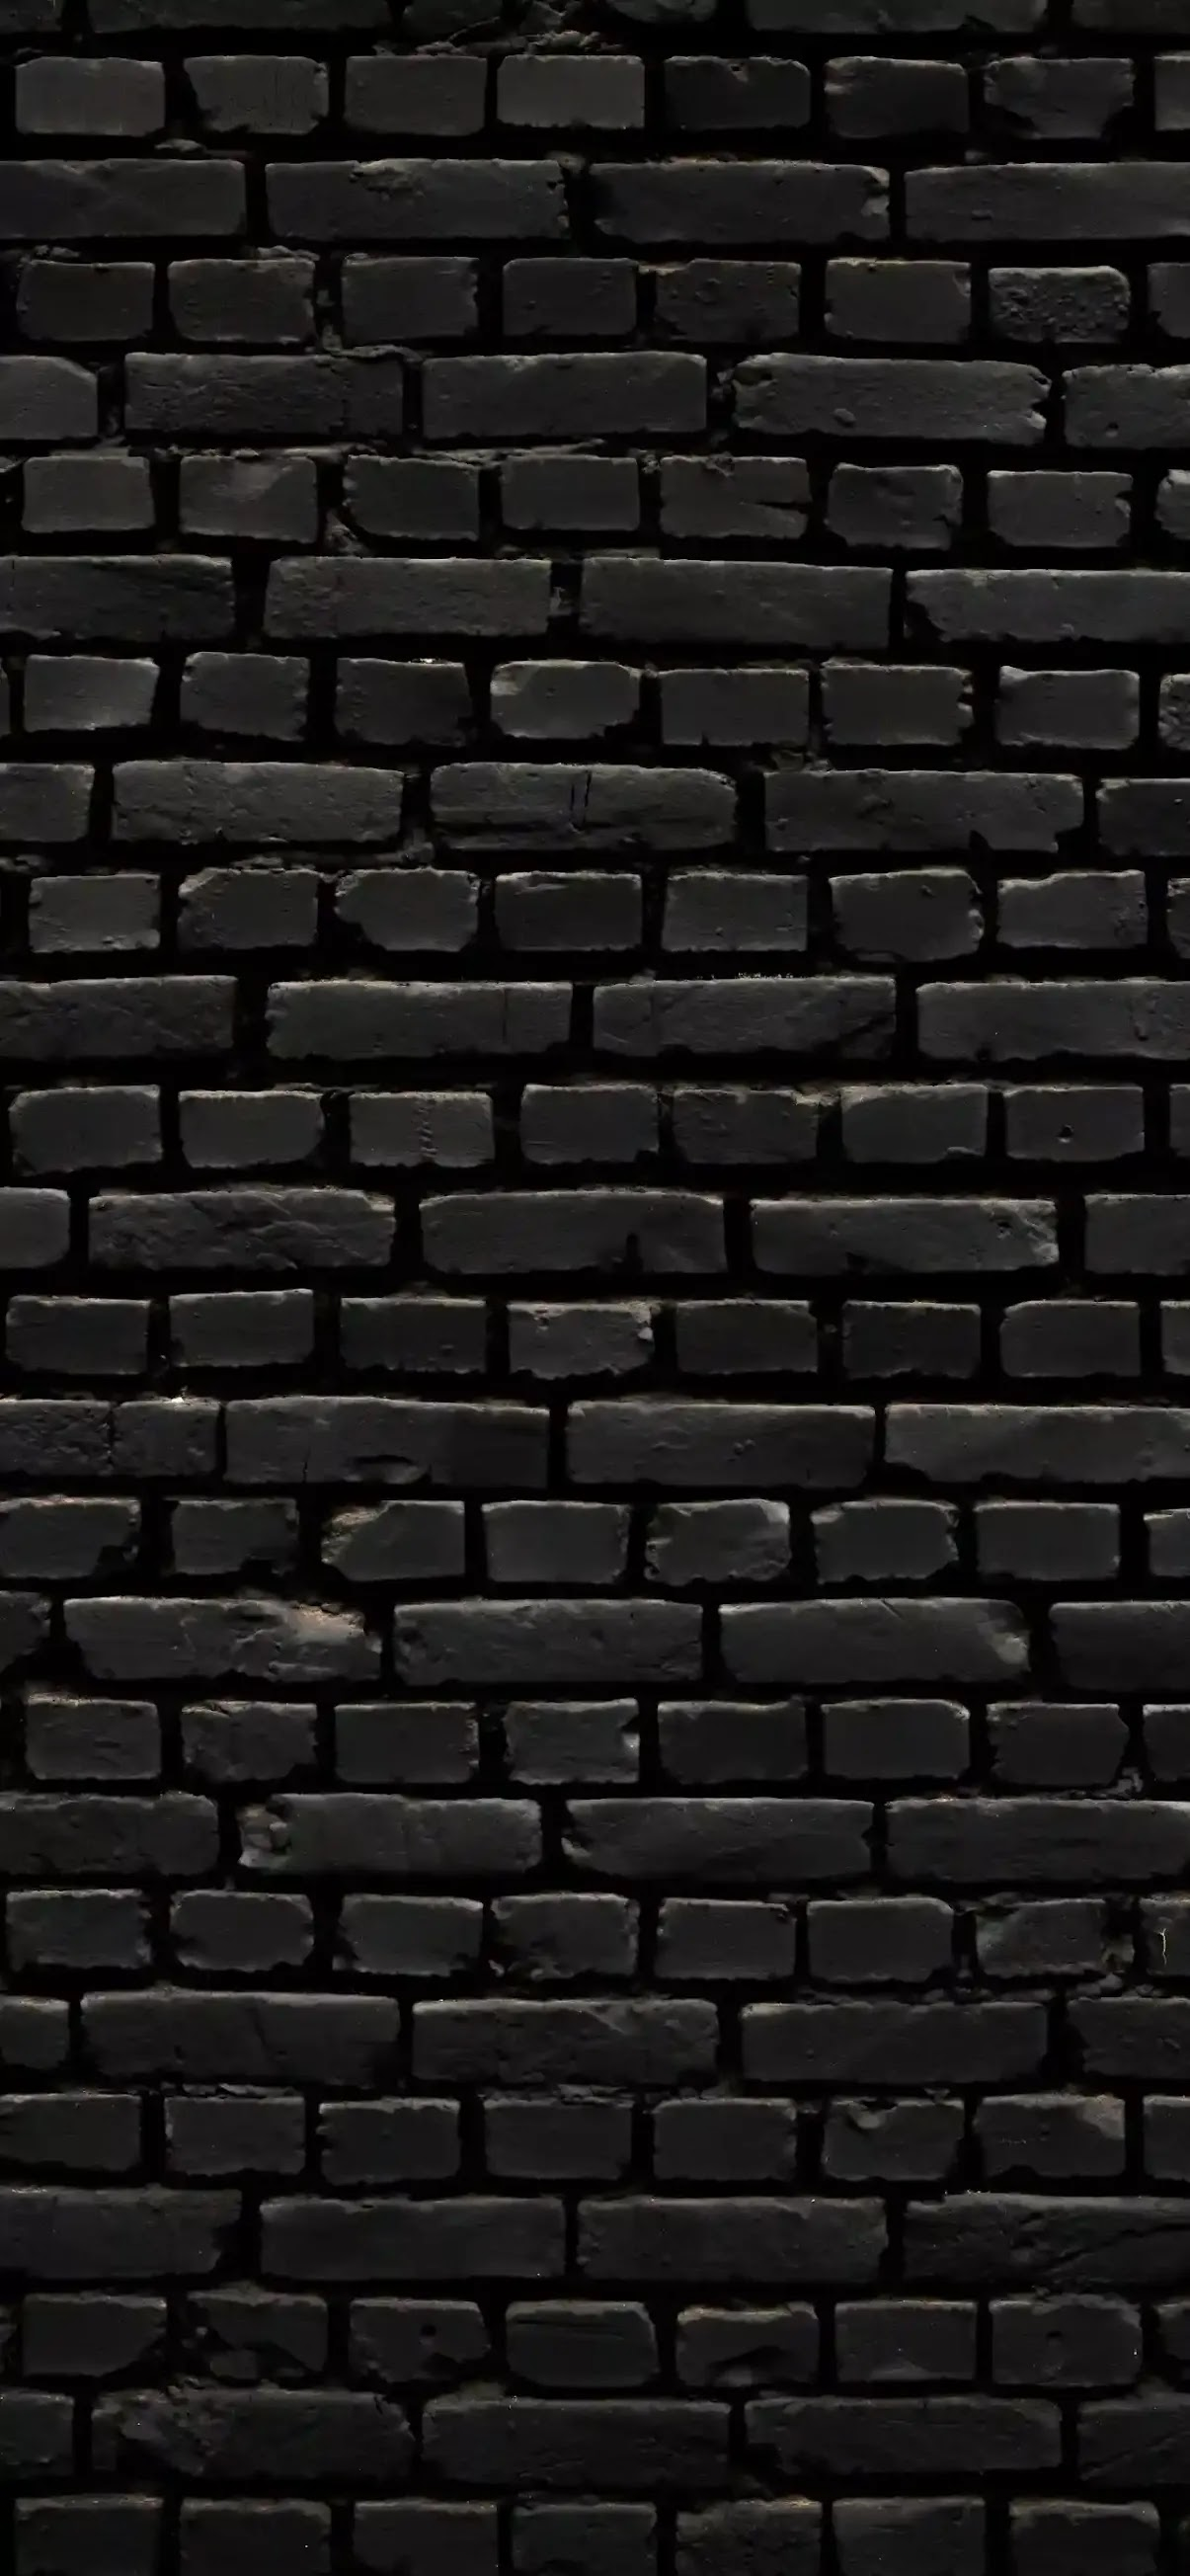 Black brick wallpaper in full hd